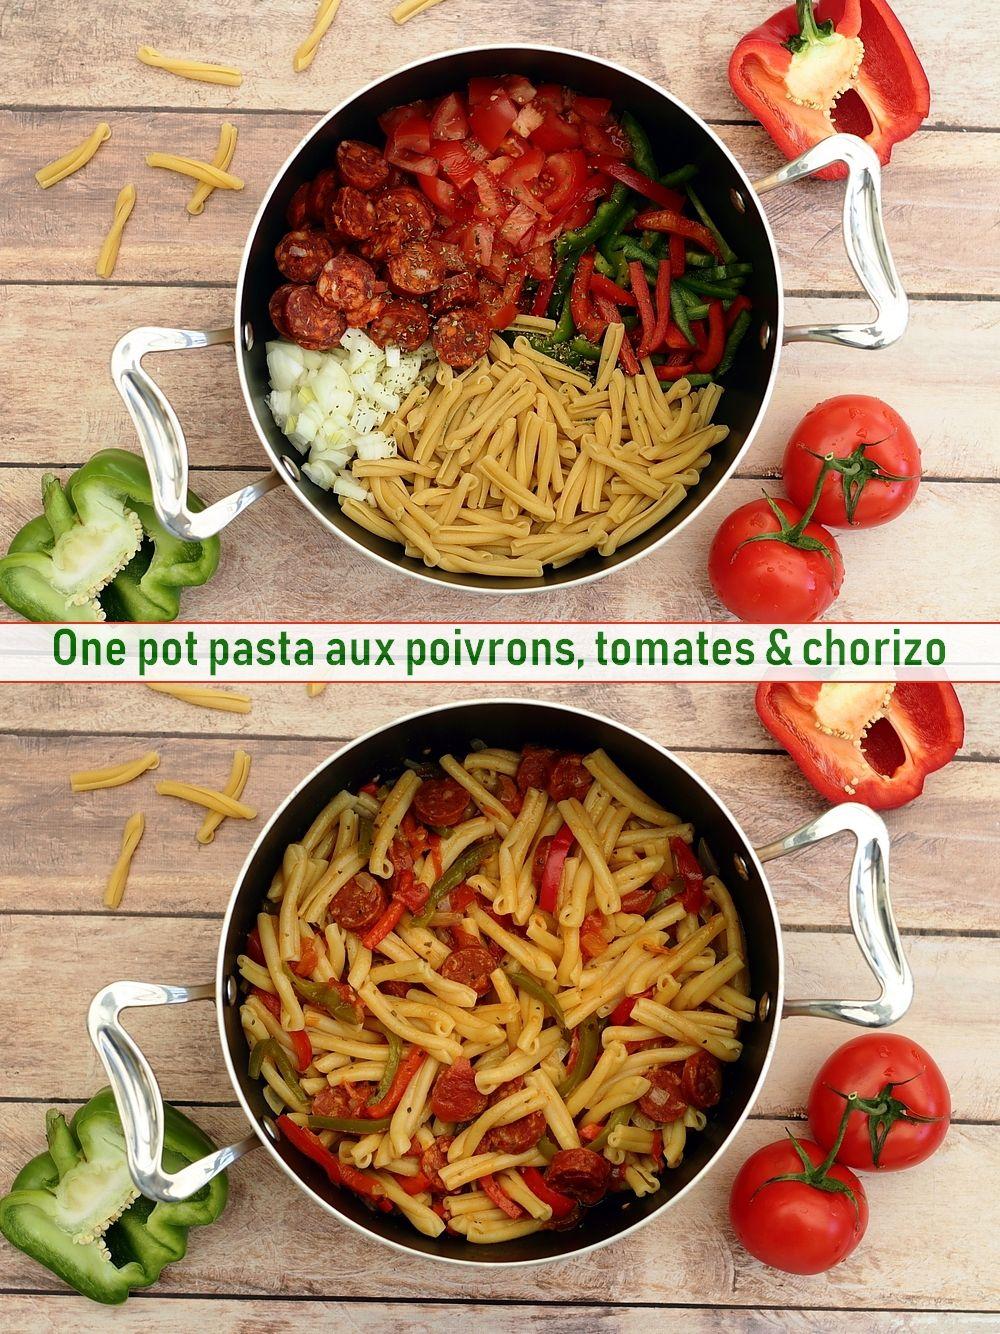 One Pot Pasta Chorizo Tomate Poivron Amandine Cooking Recette Chorizo Recette Poivron Recette